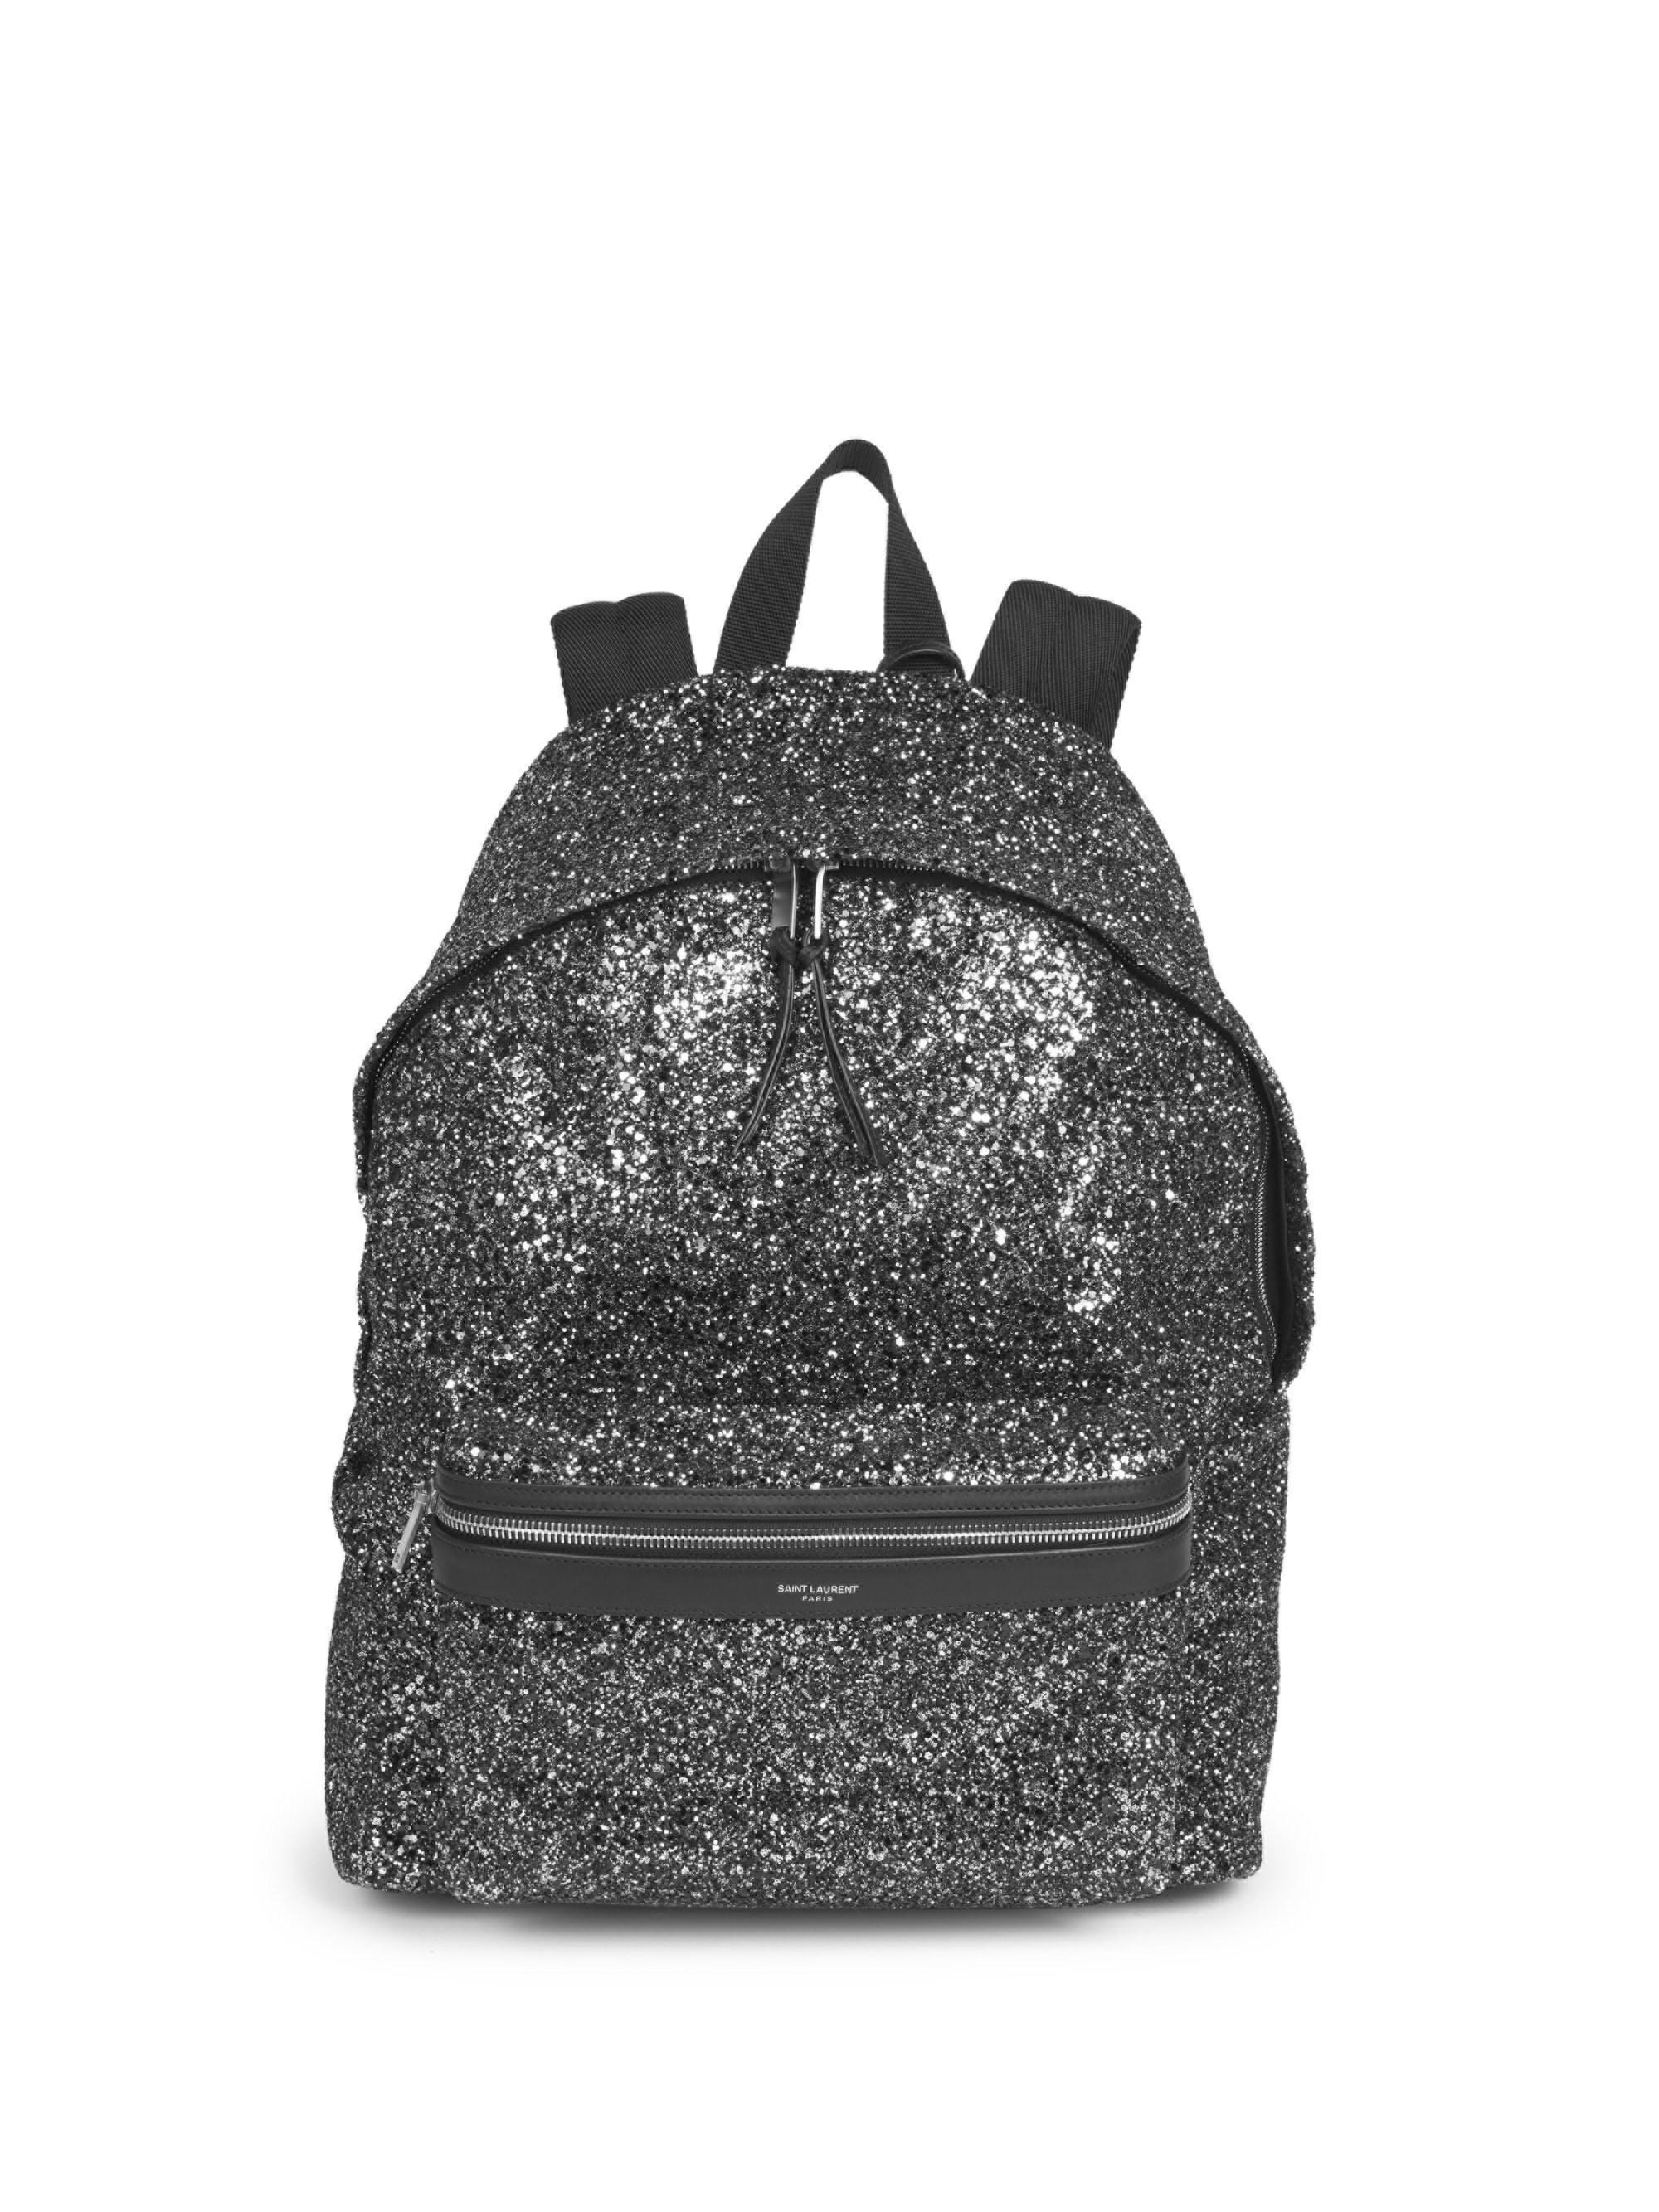 516d14003 Saint Laurent - Black Classic Zip Backpack for Men - Lyst. View fullscreen